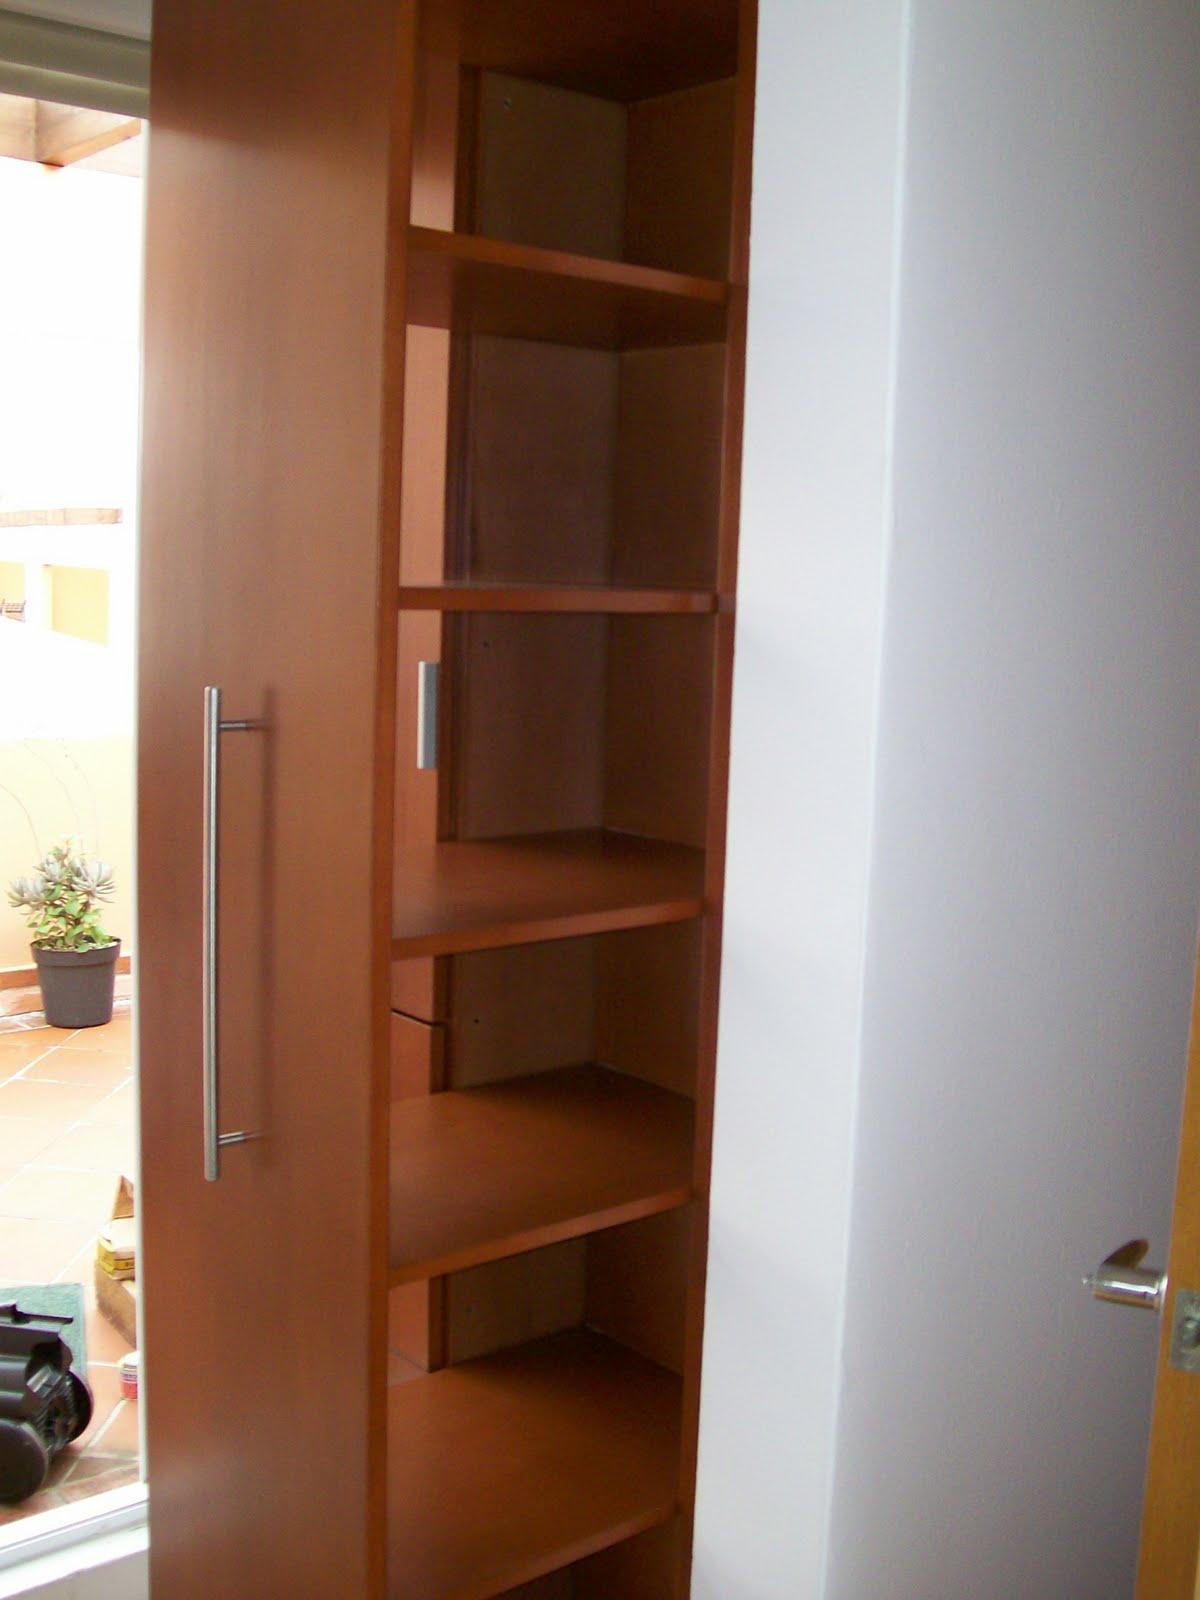 Closet muebles sobre dise o avl for Disenos de zapateras de madera